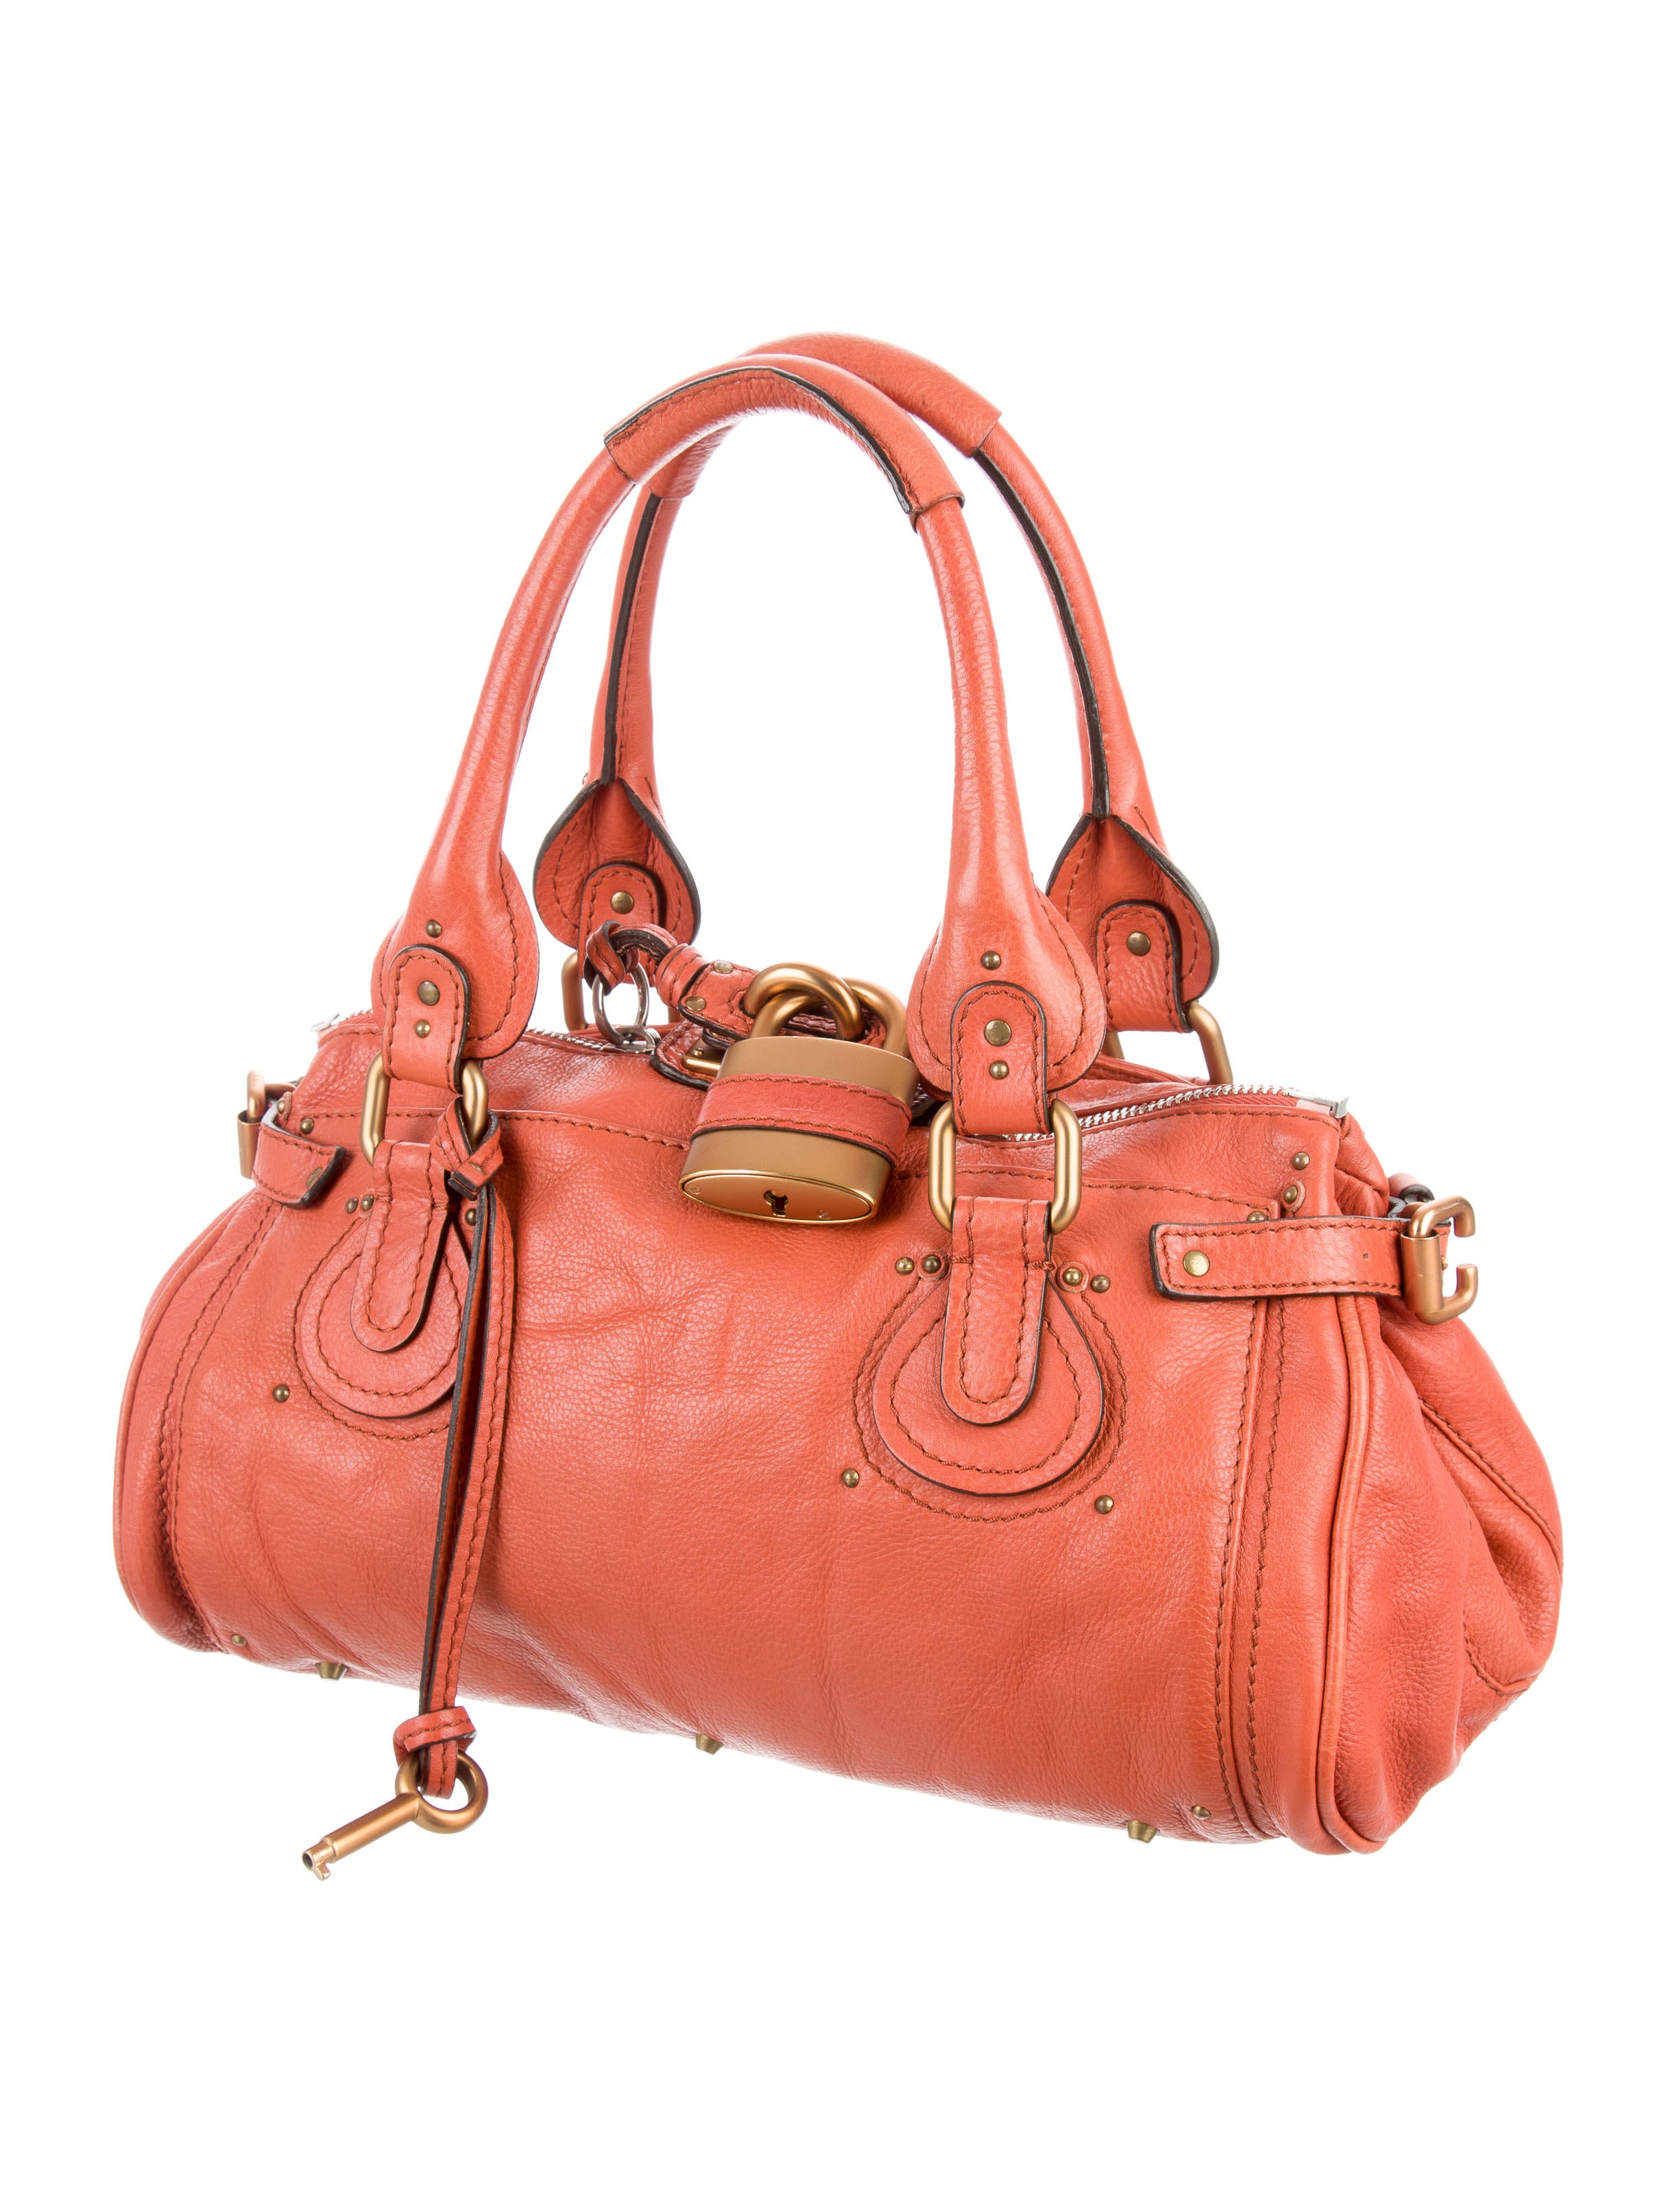 1b9ffb0b5c5 Chloé Paddington Bag - Handbags - CHL60798